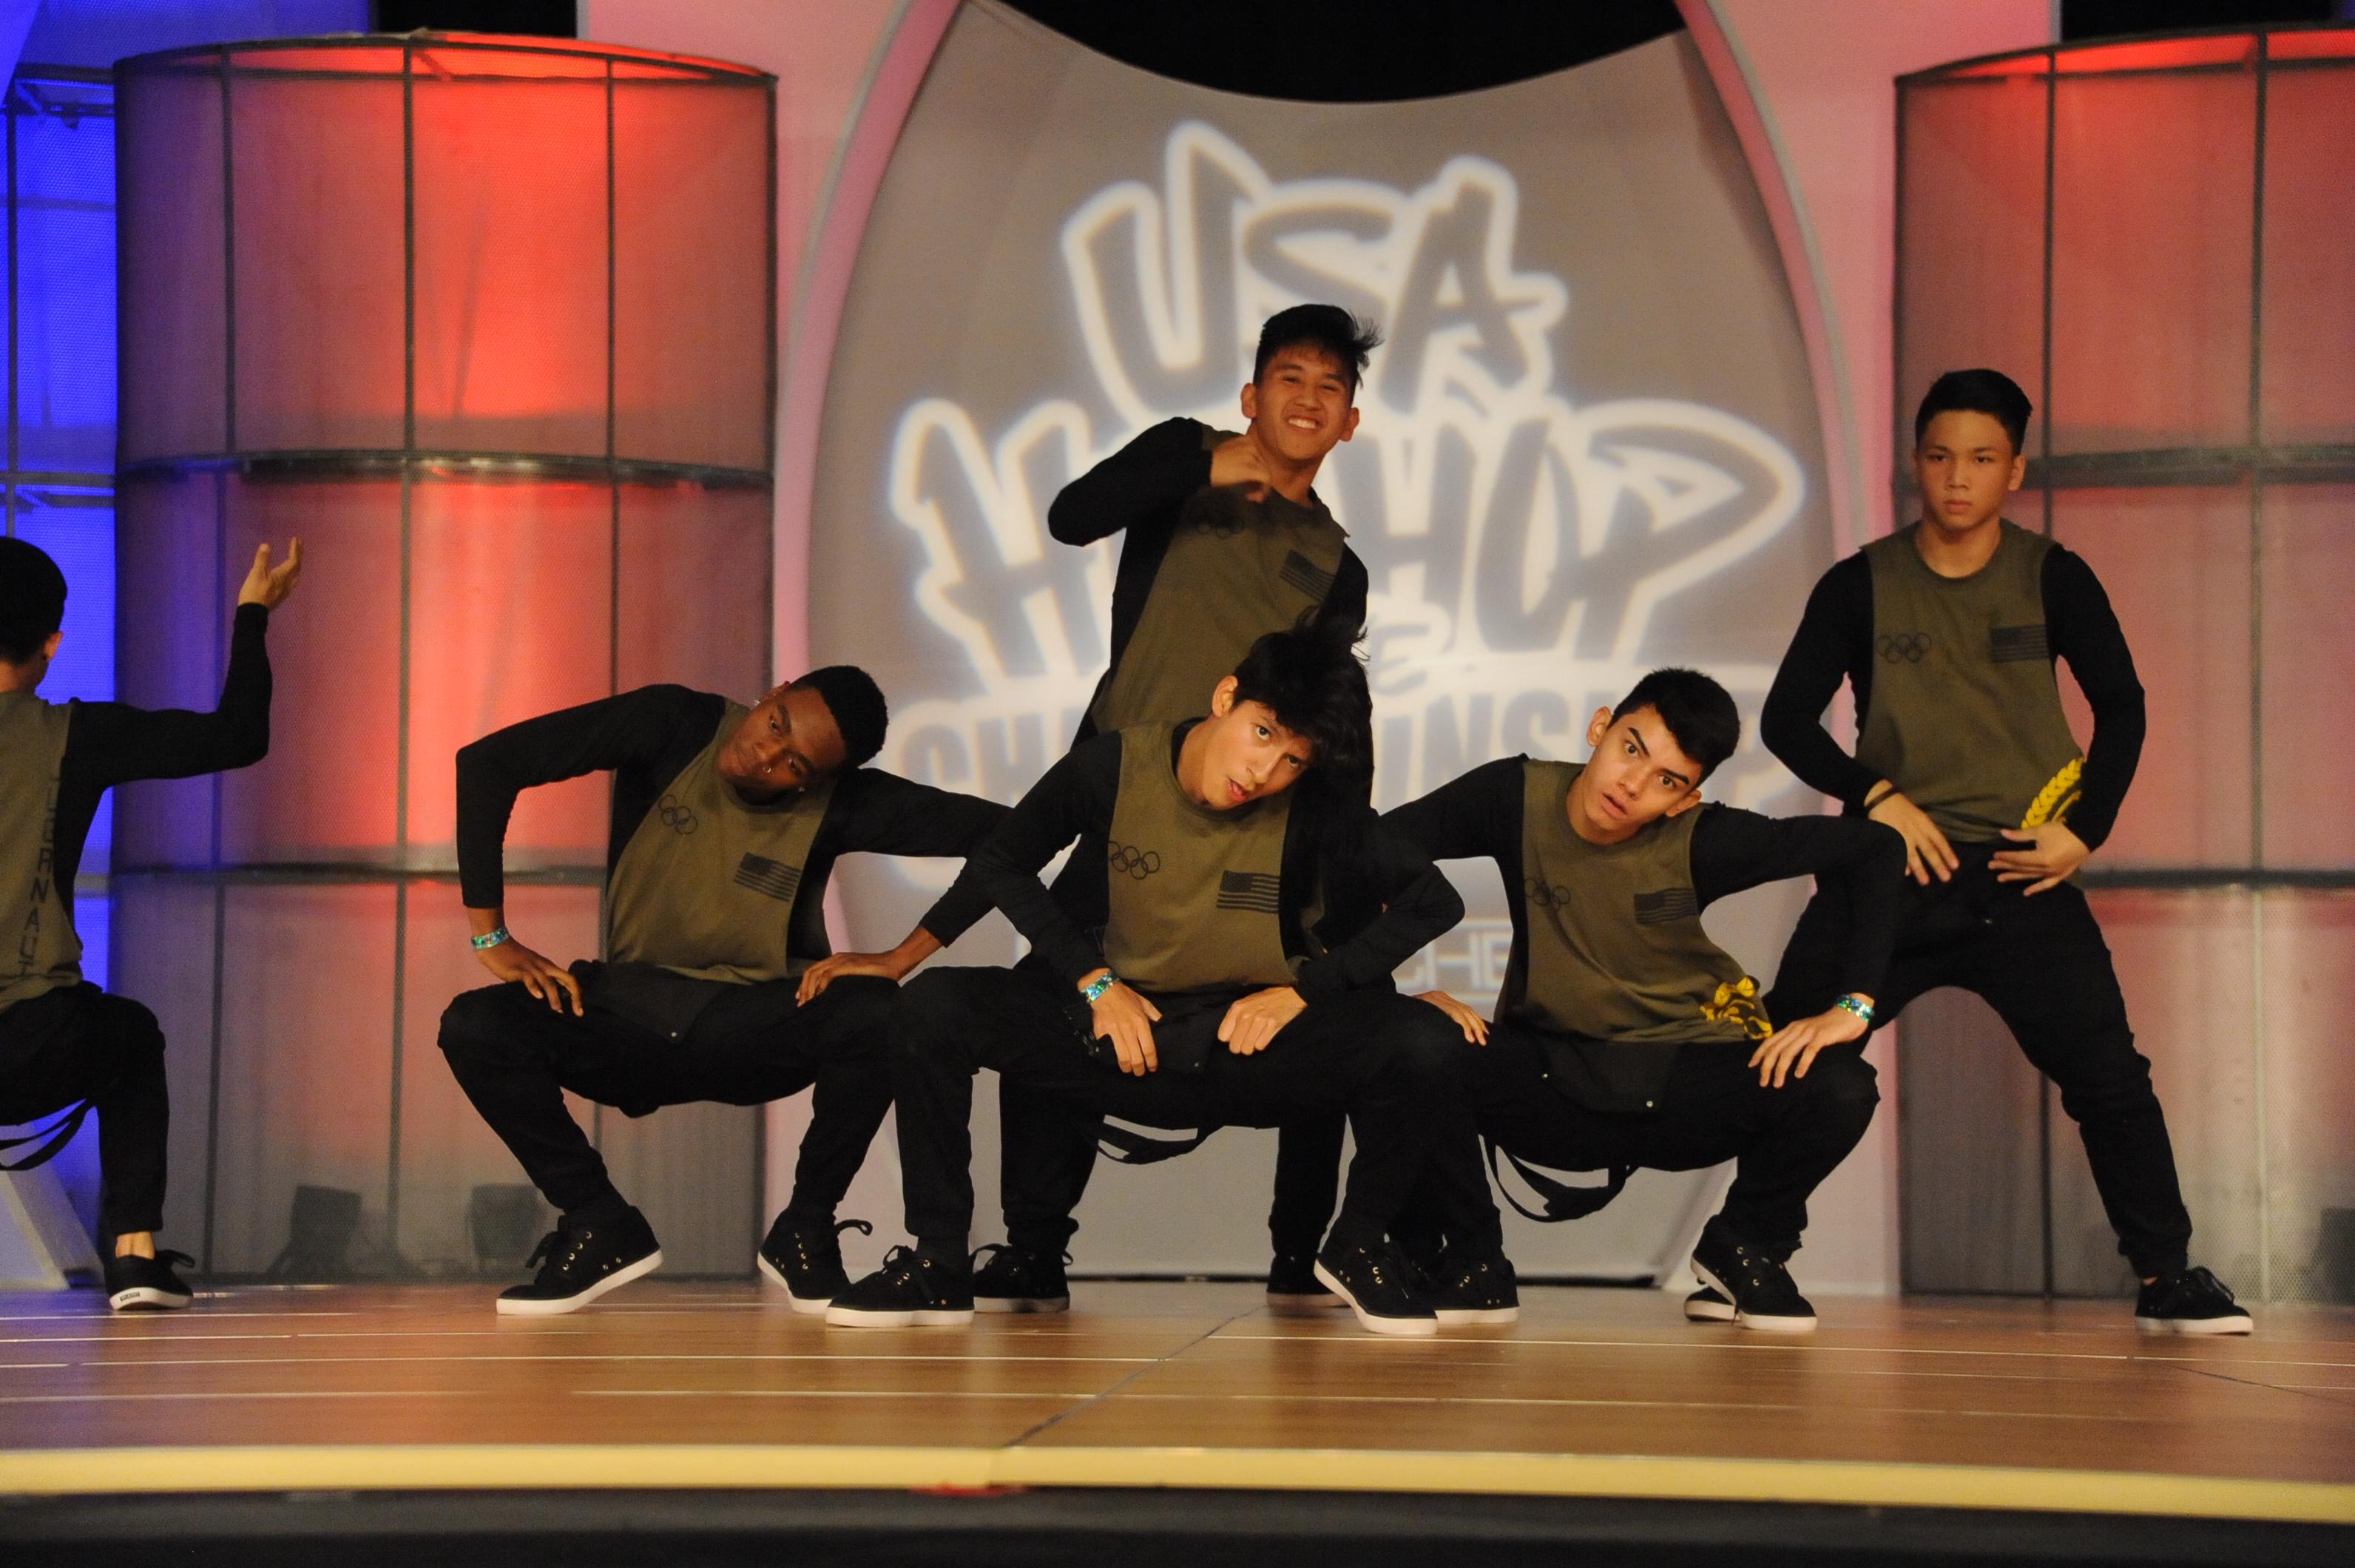 USA_V_Brobots Dance Crew_grp2